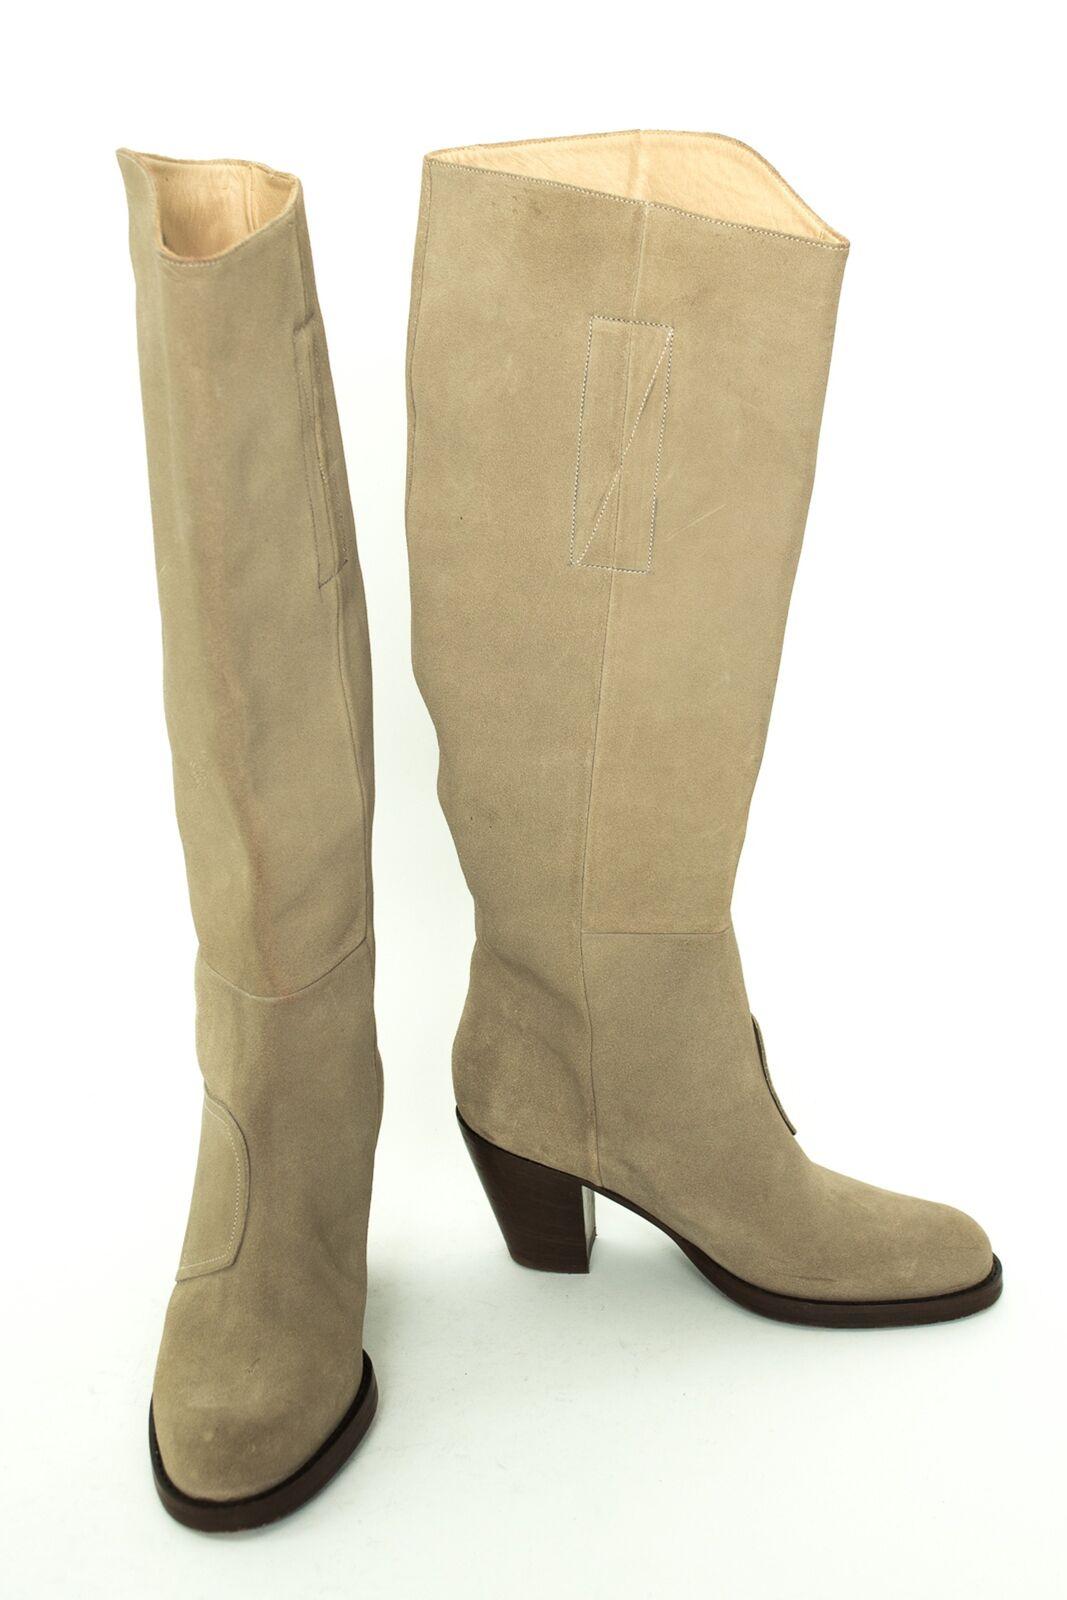 VERO CUOIO Stiefel Gr. EU 37 Damen Schuhe Boots High Heels Shoes Graubeige Leder